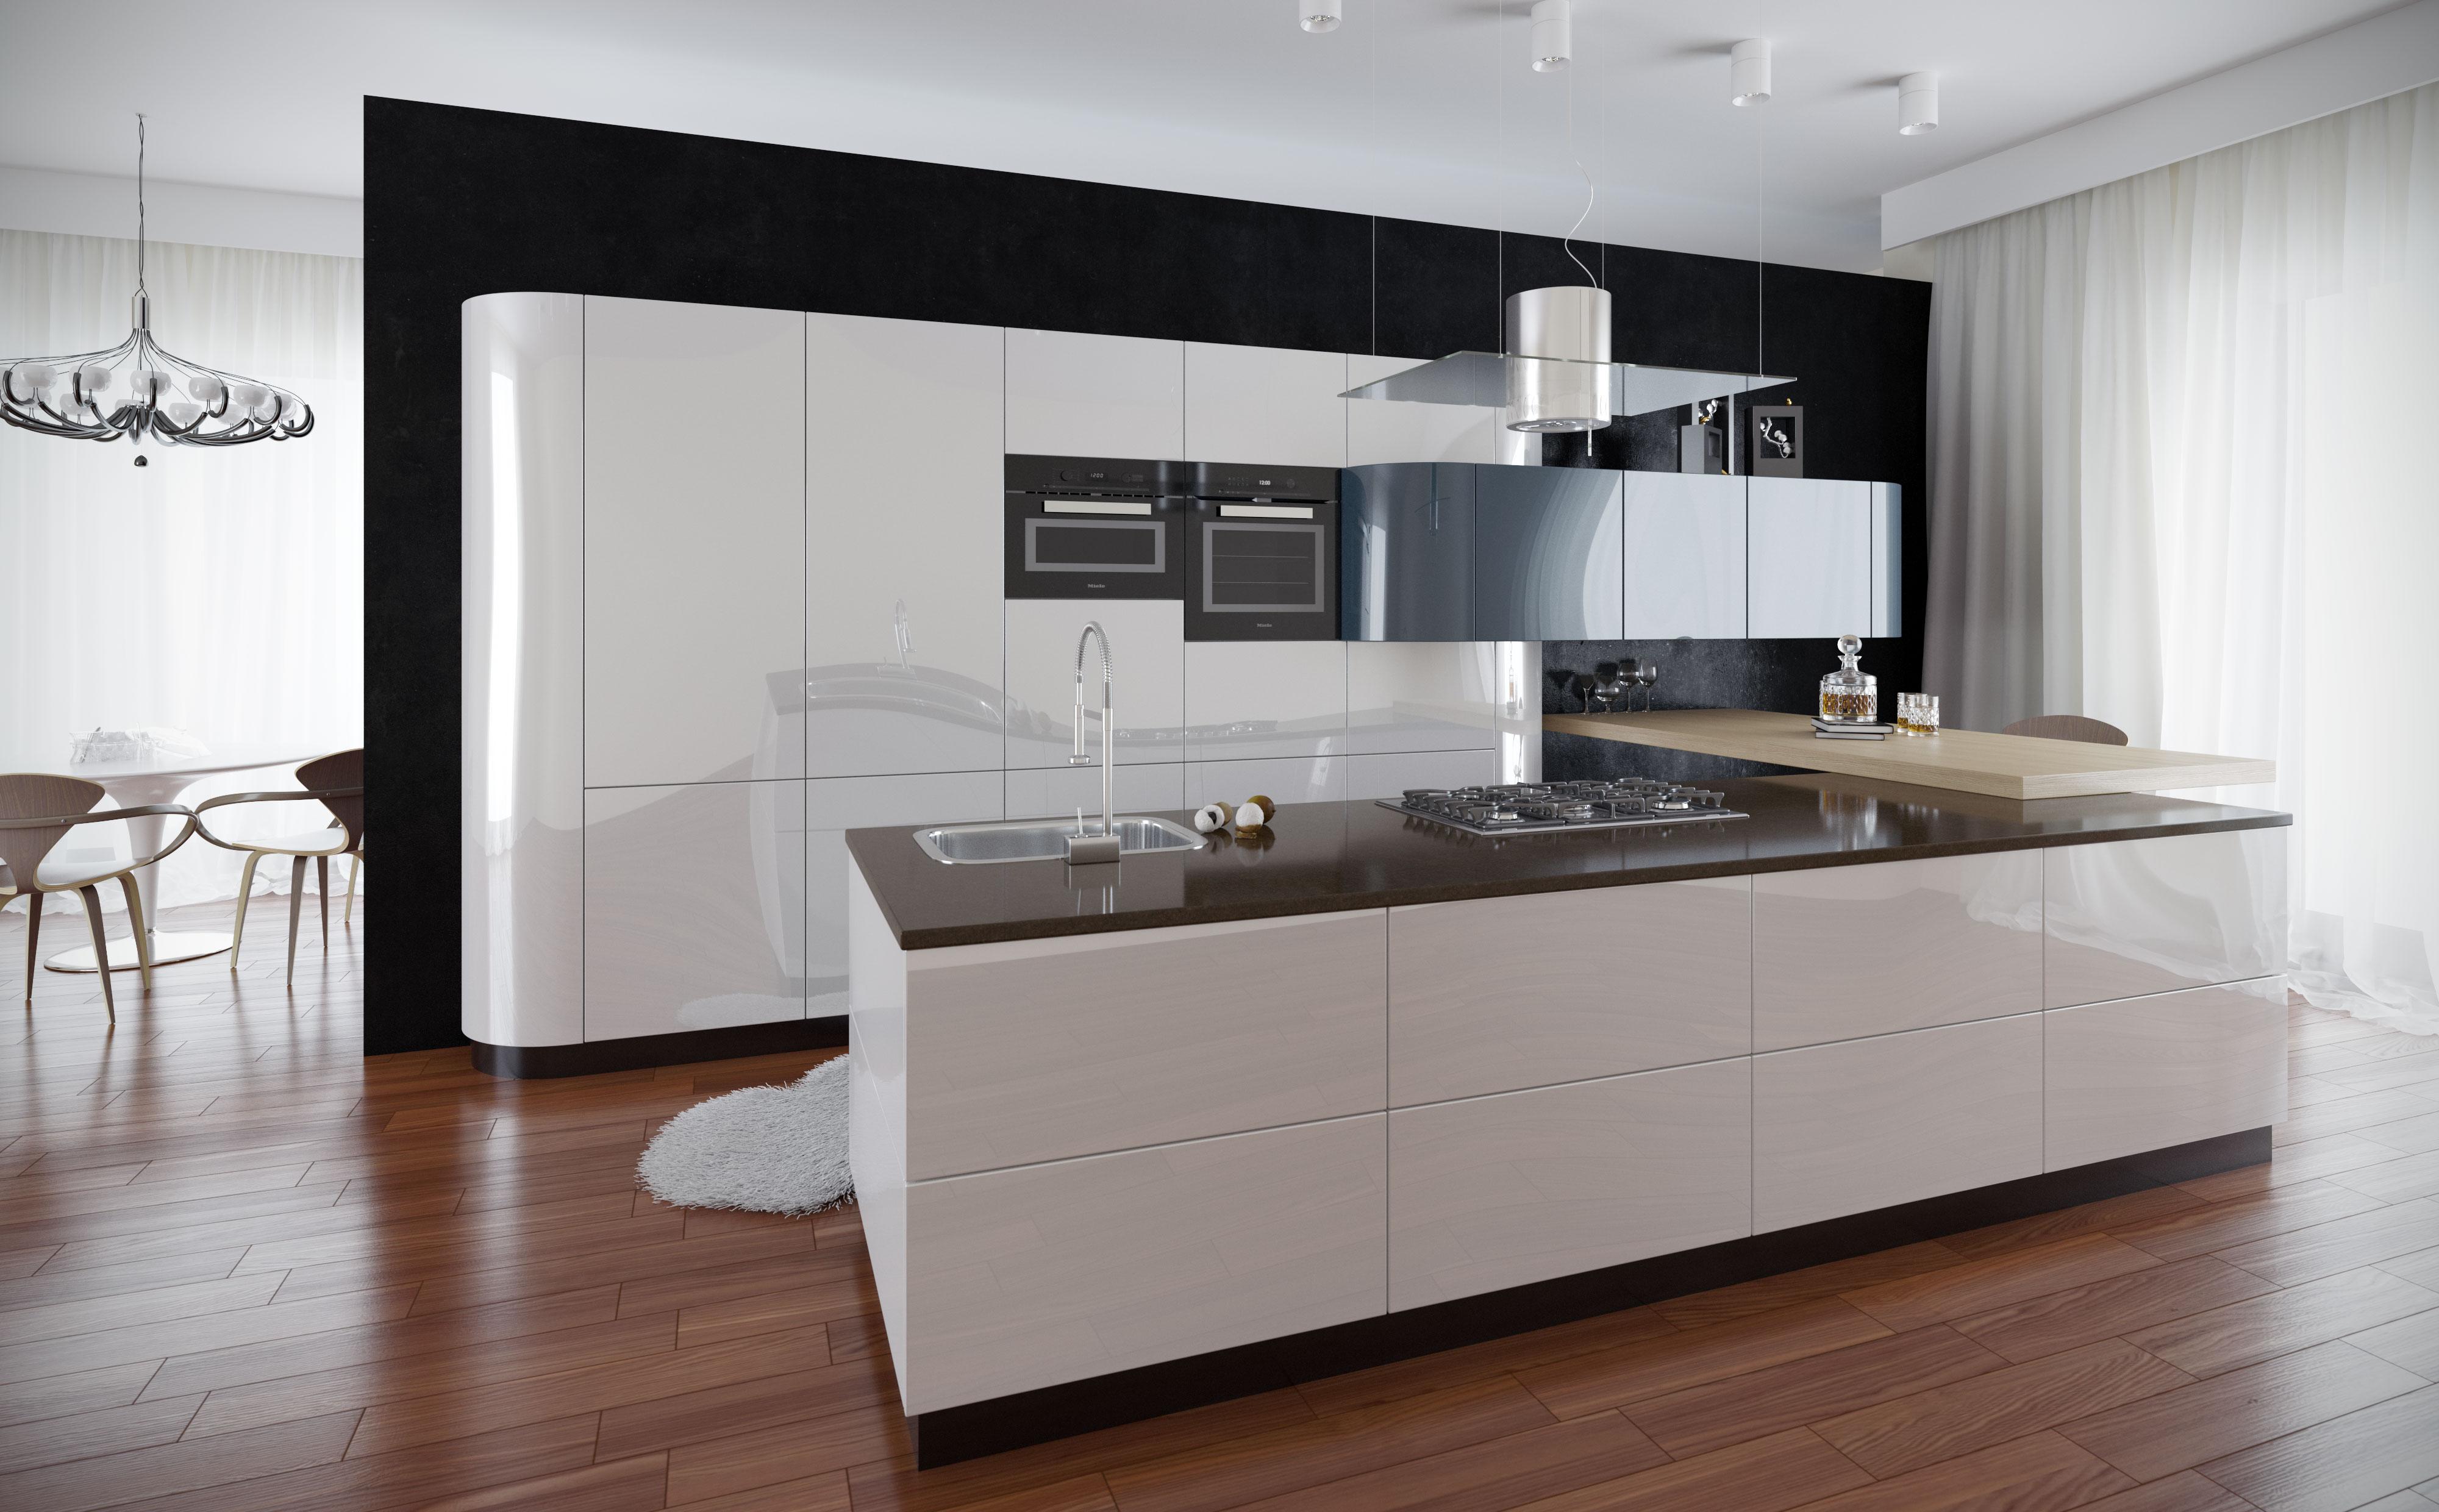 кухня с глянцевыми фасадами фото